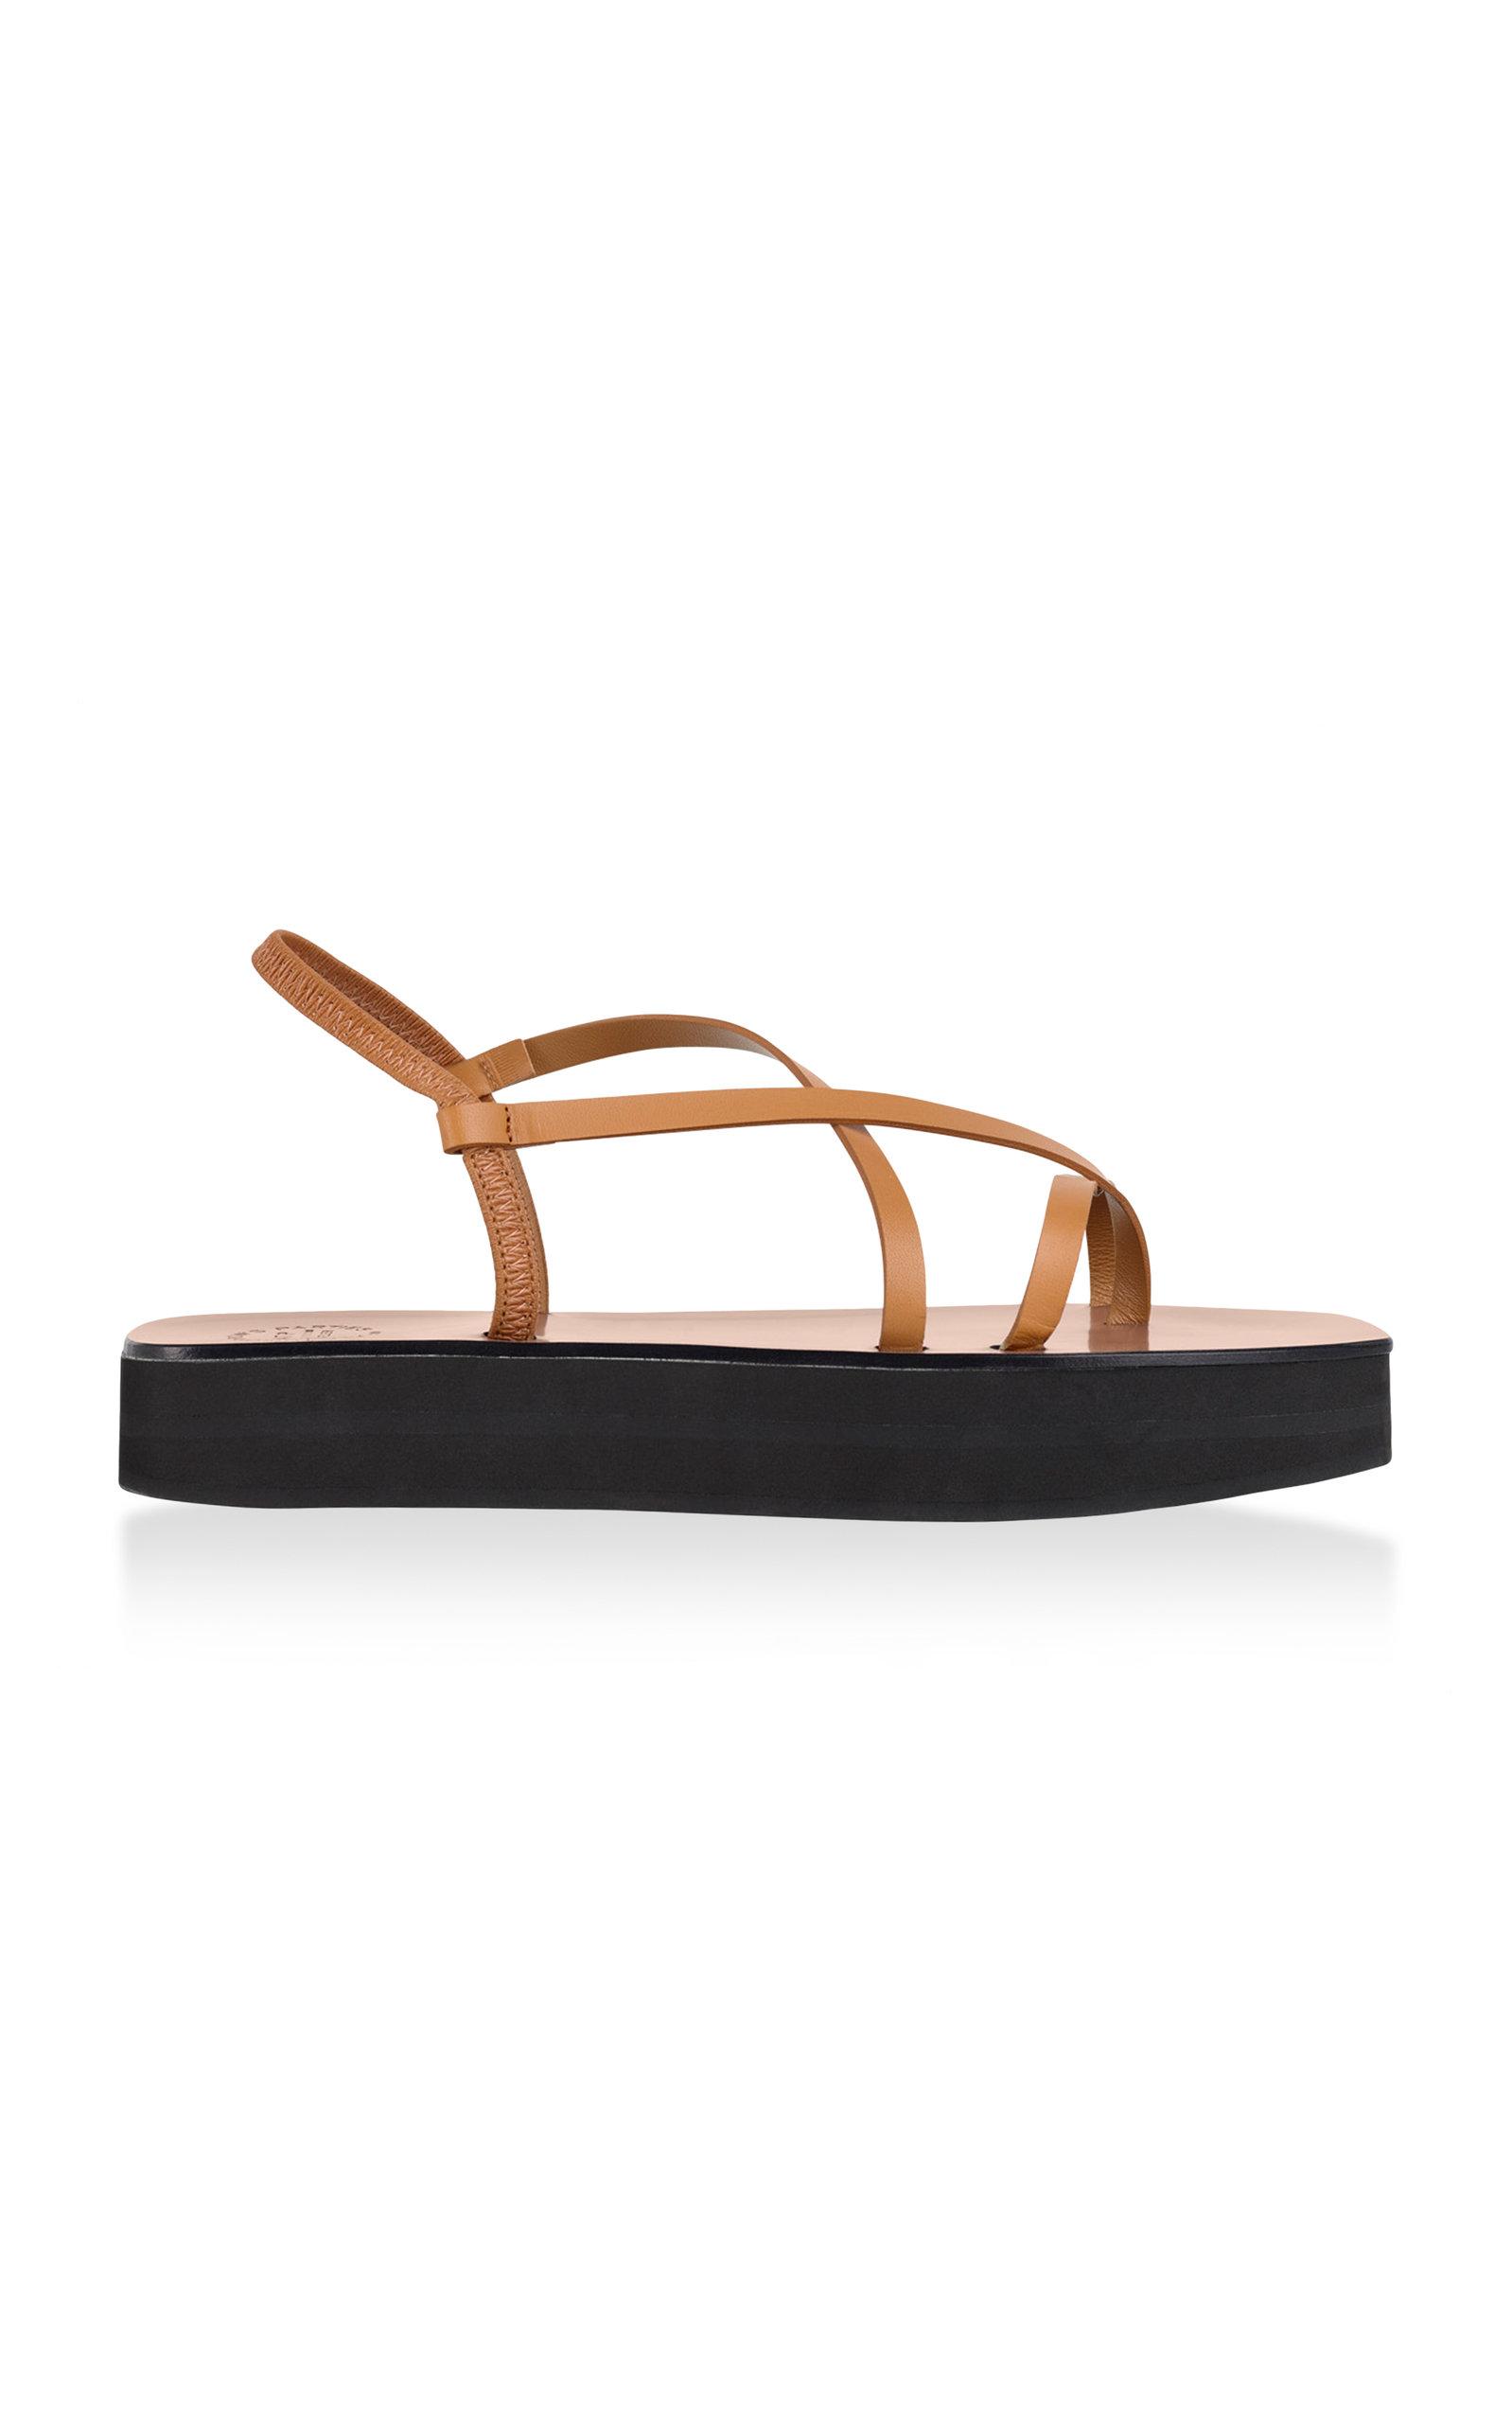 Maremma Leather Platform Sandals by ATP Atelier